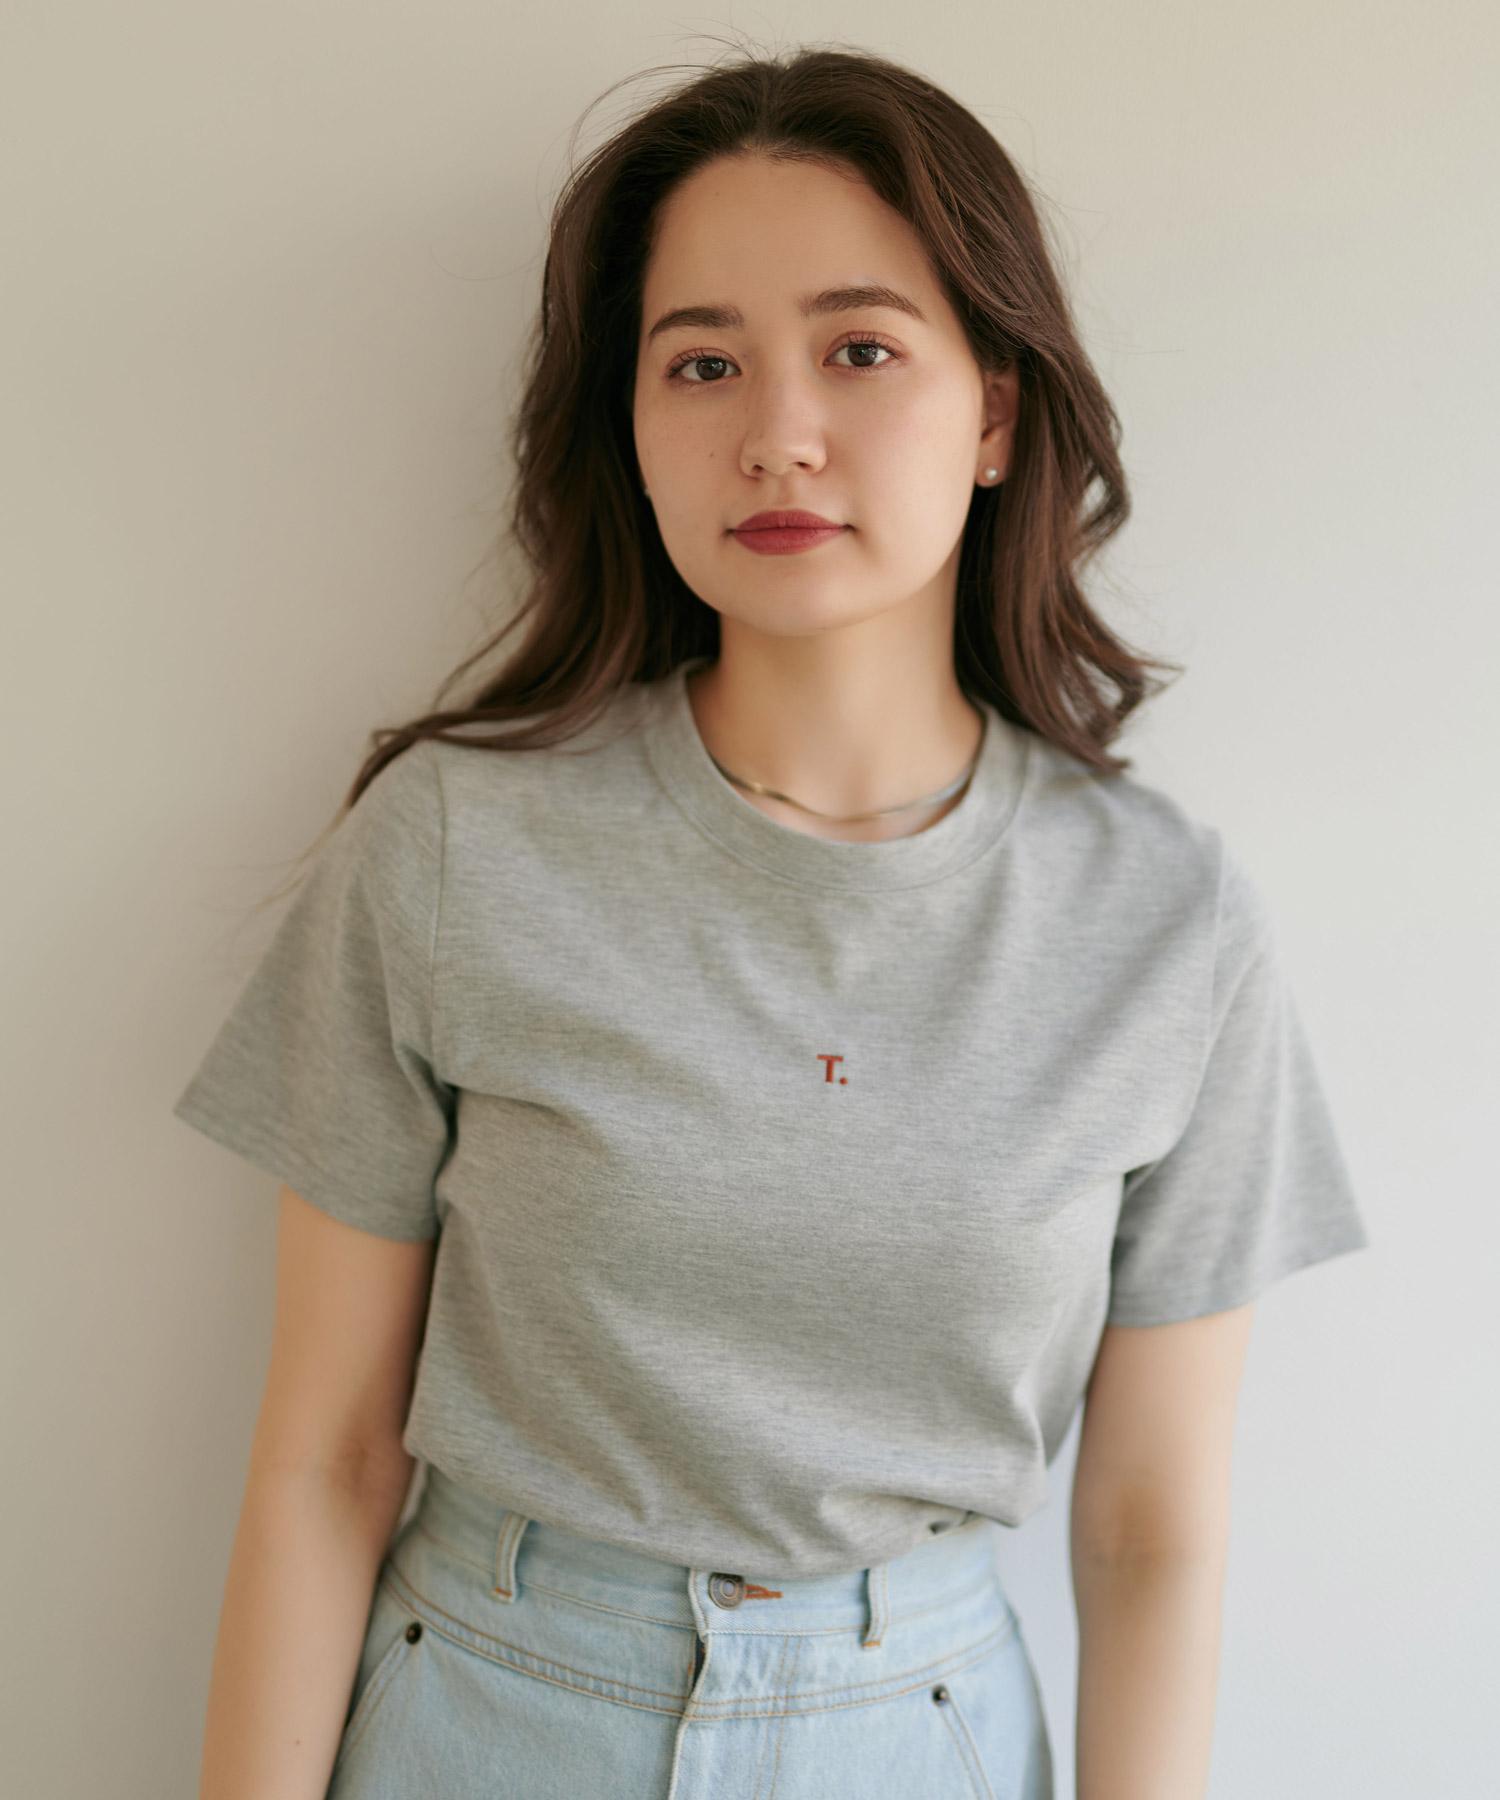 T.刺繍Tシャツ TINA:JOJUN